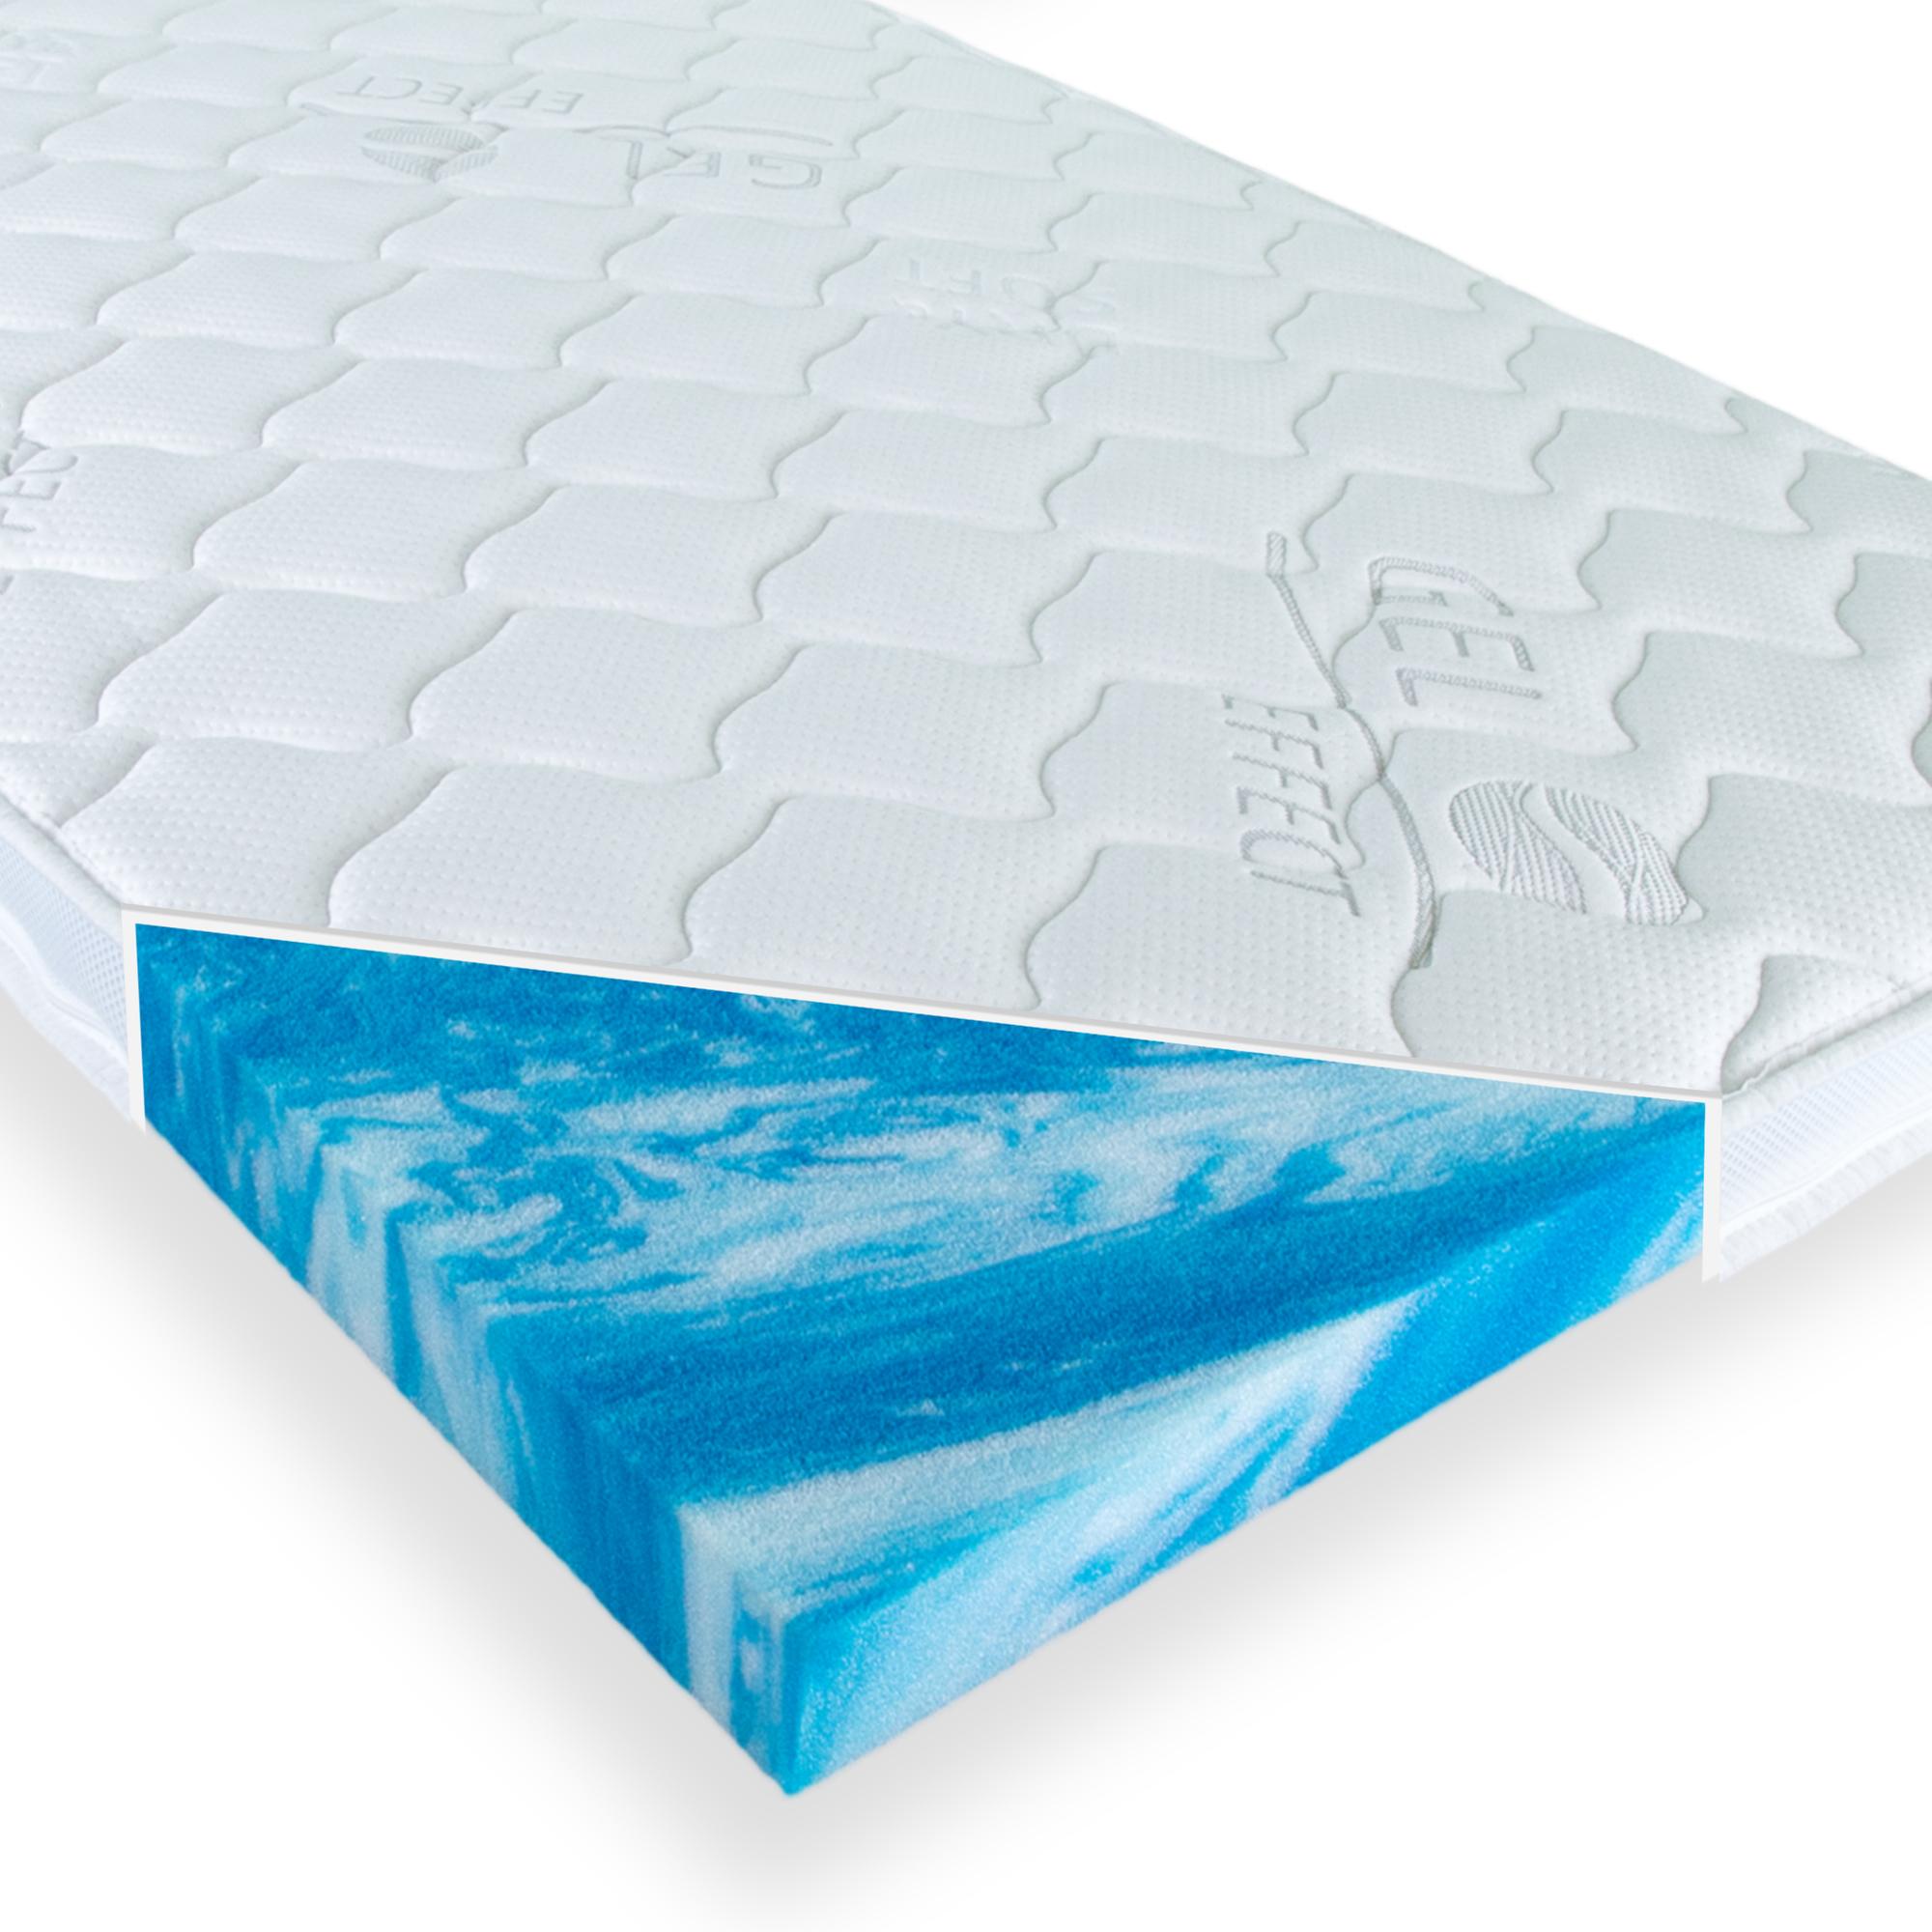 Gelschaum Topper Hydroblu Gel Matratzentopper Komfort